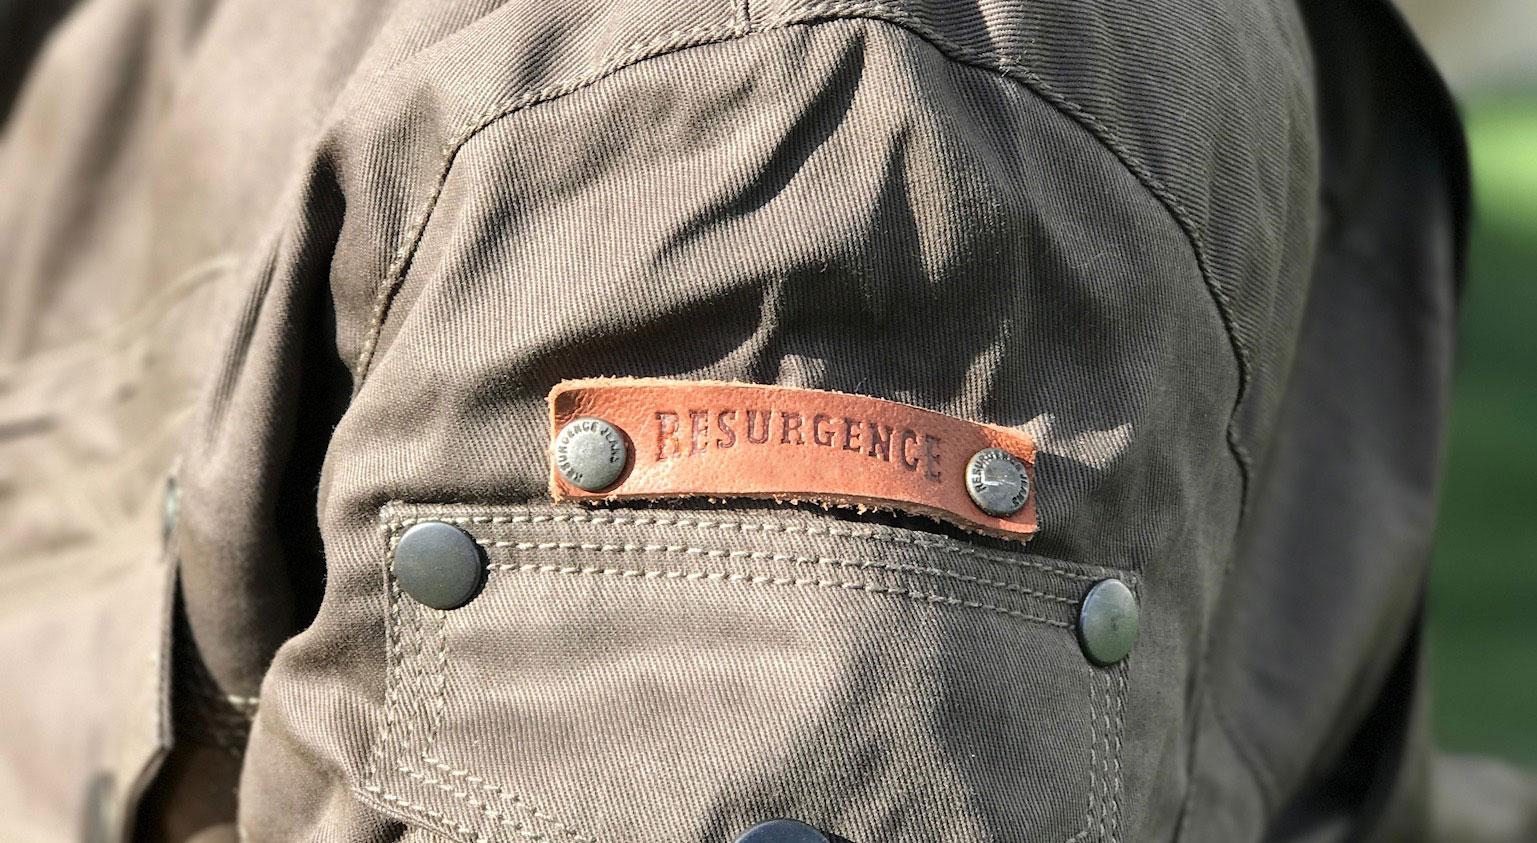 Resurgence Gear - Rocker Jacket - Guide to buy motorcycle clothing gear